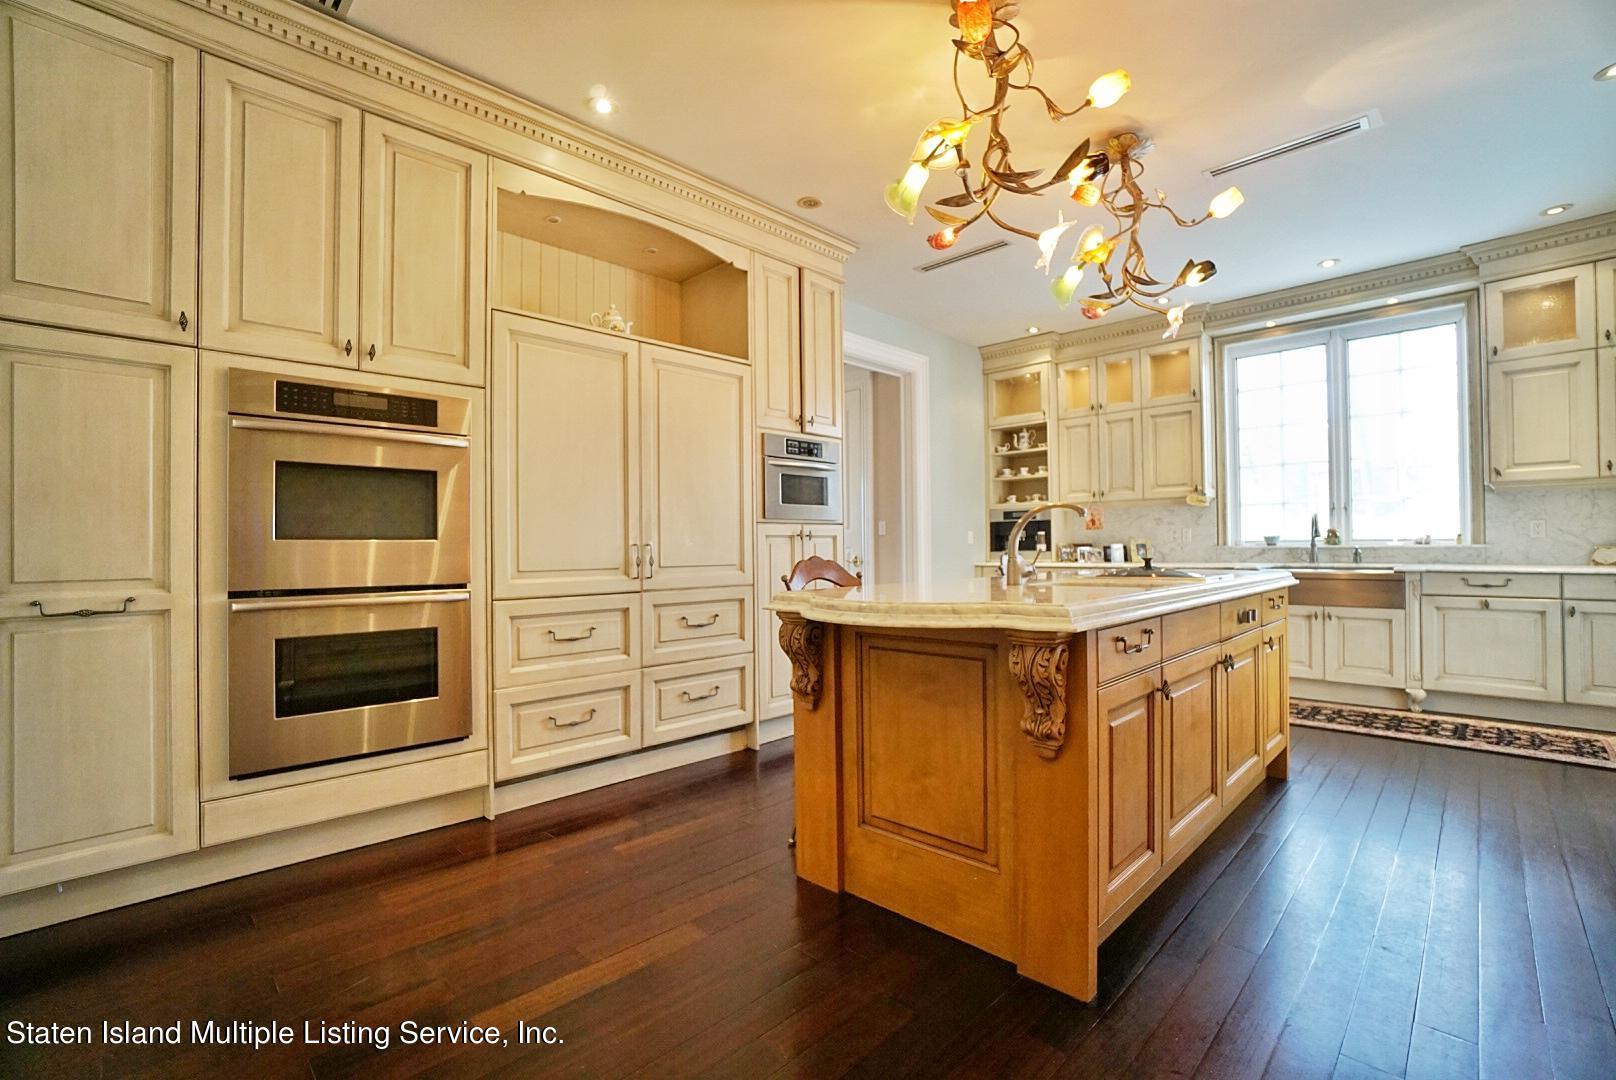 Single Family - Detached 129 Coverly Avenue   Staten Island, NY 10301, MLS-1144490-26